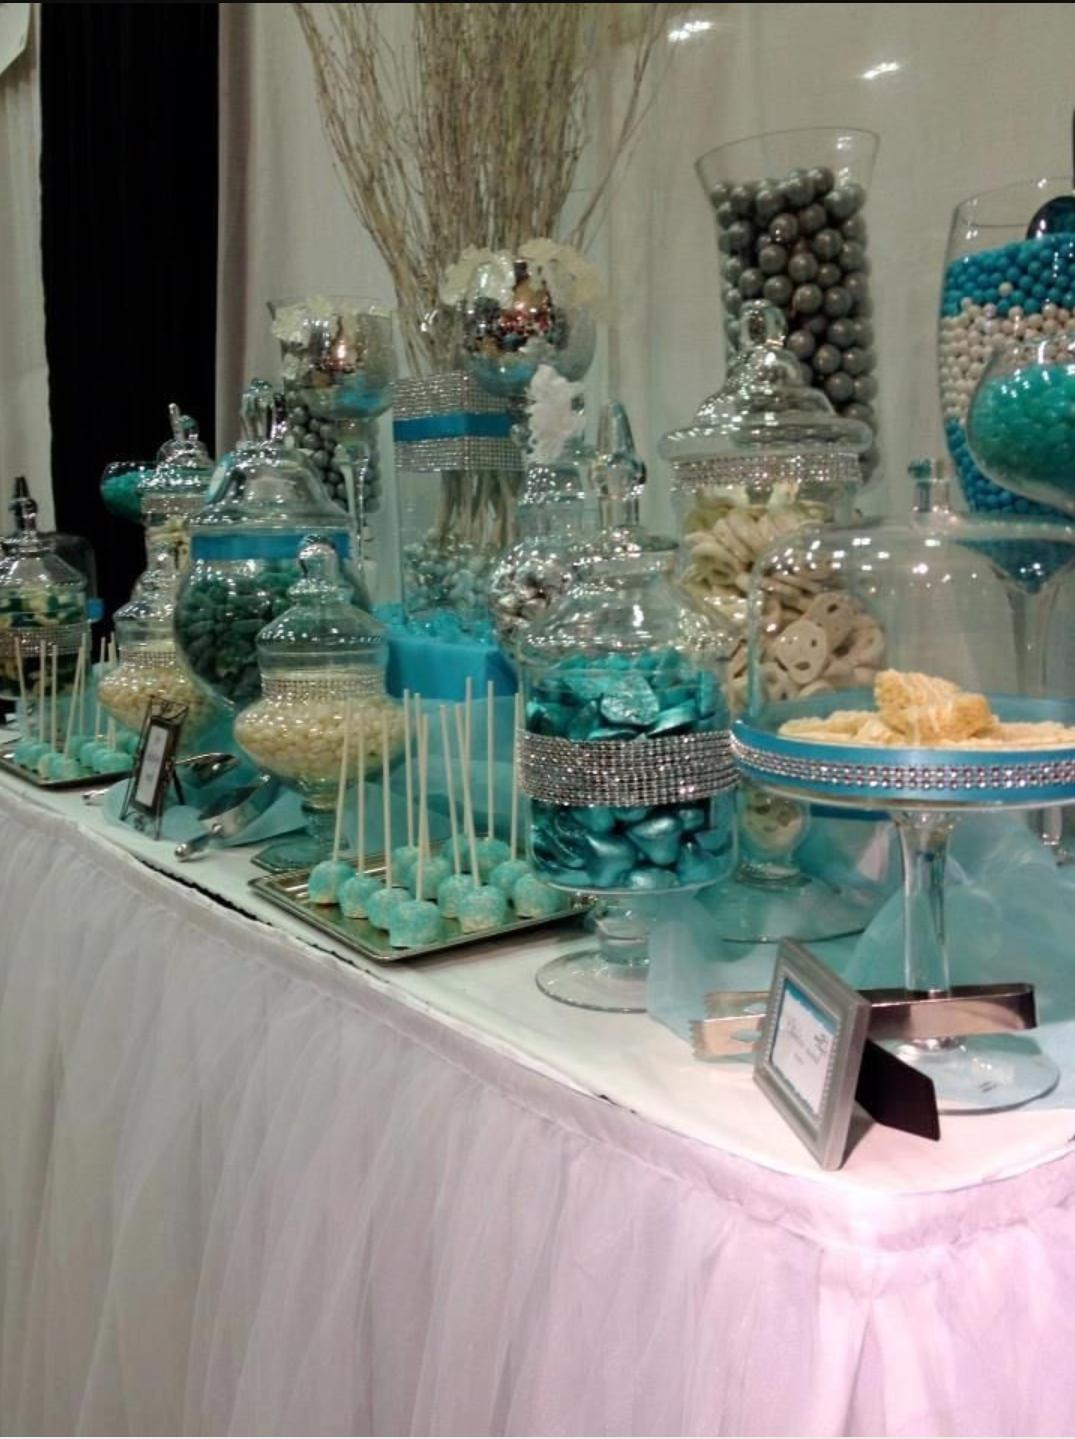 Weddings at Events By Keisha, Bromley, Kent